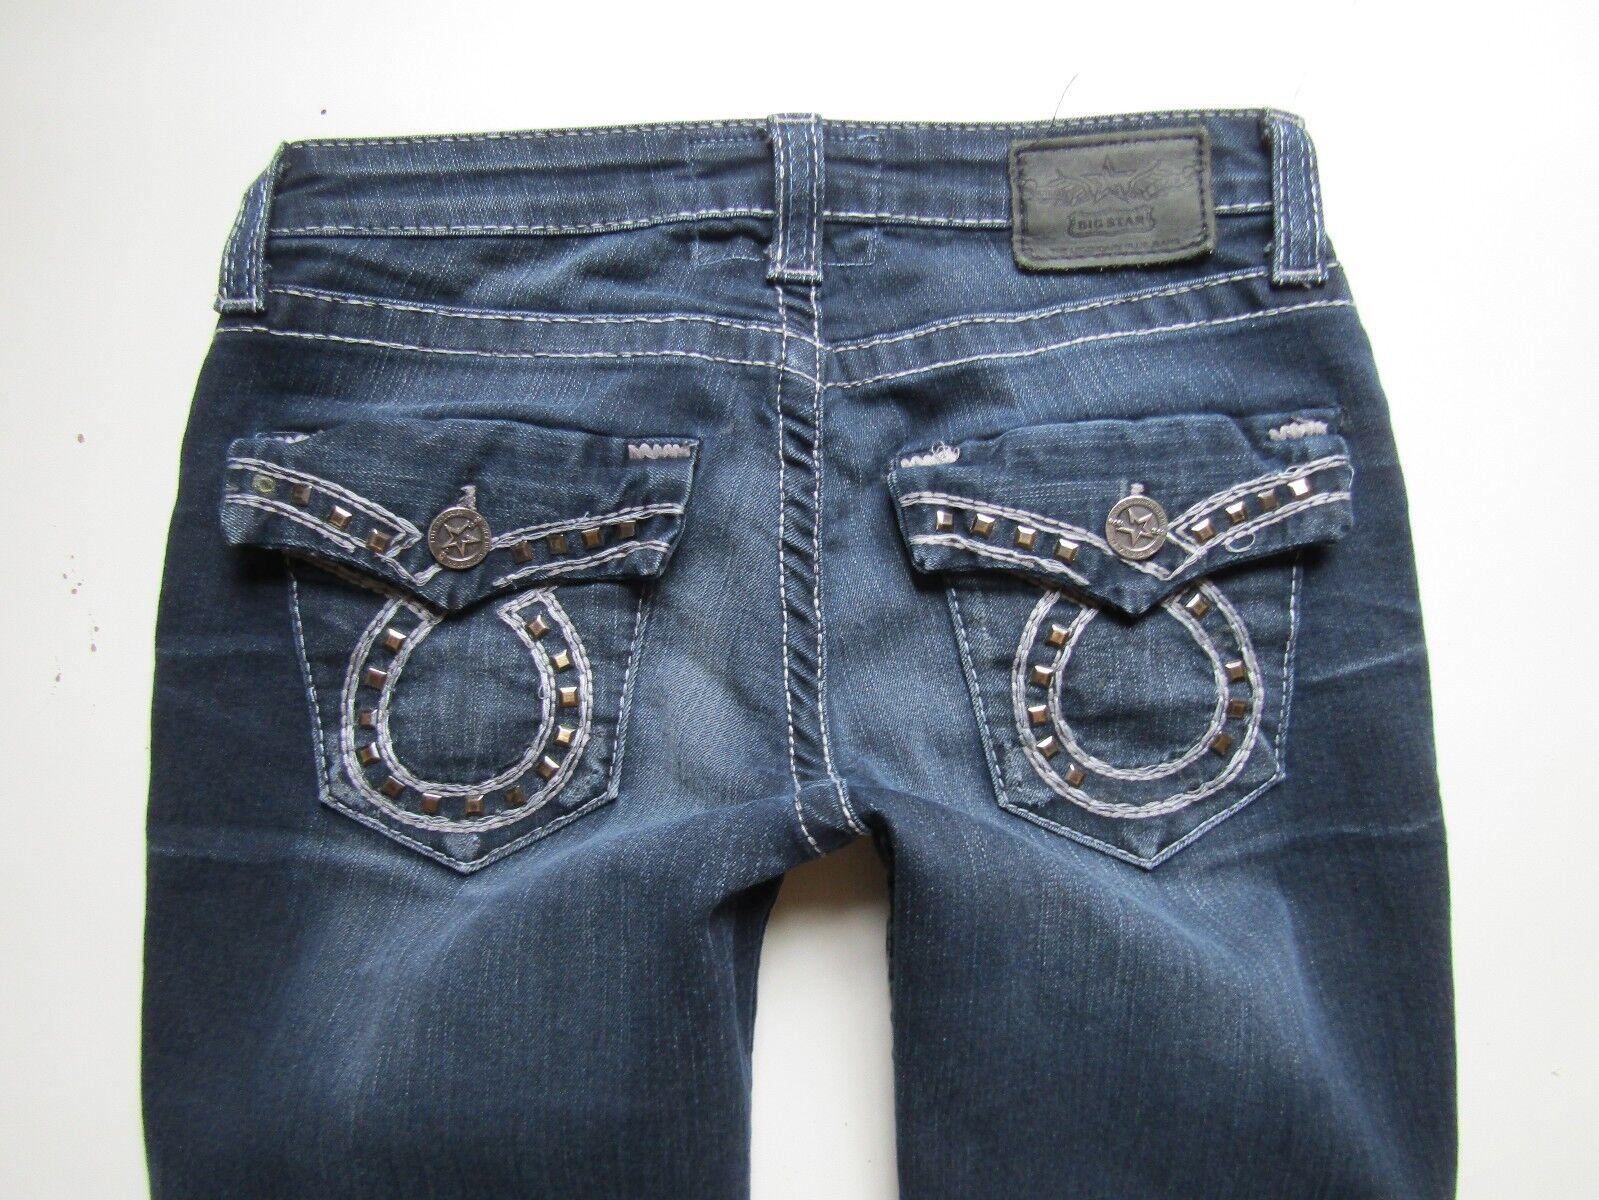 BIG STAR Miki Low Rise Boot Cut Jean, Dark Wash - Size 25 x 30 Short